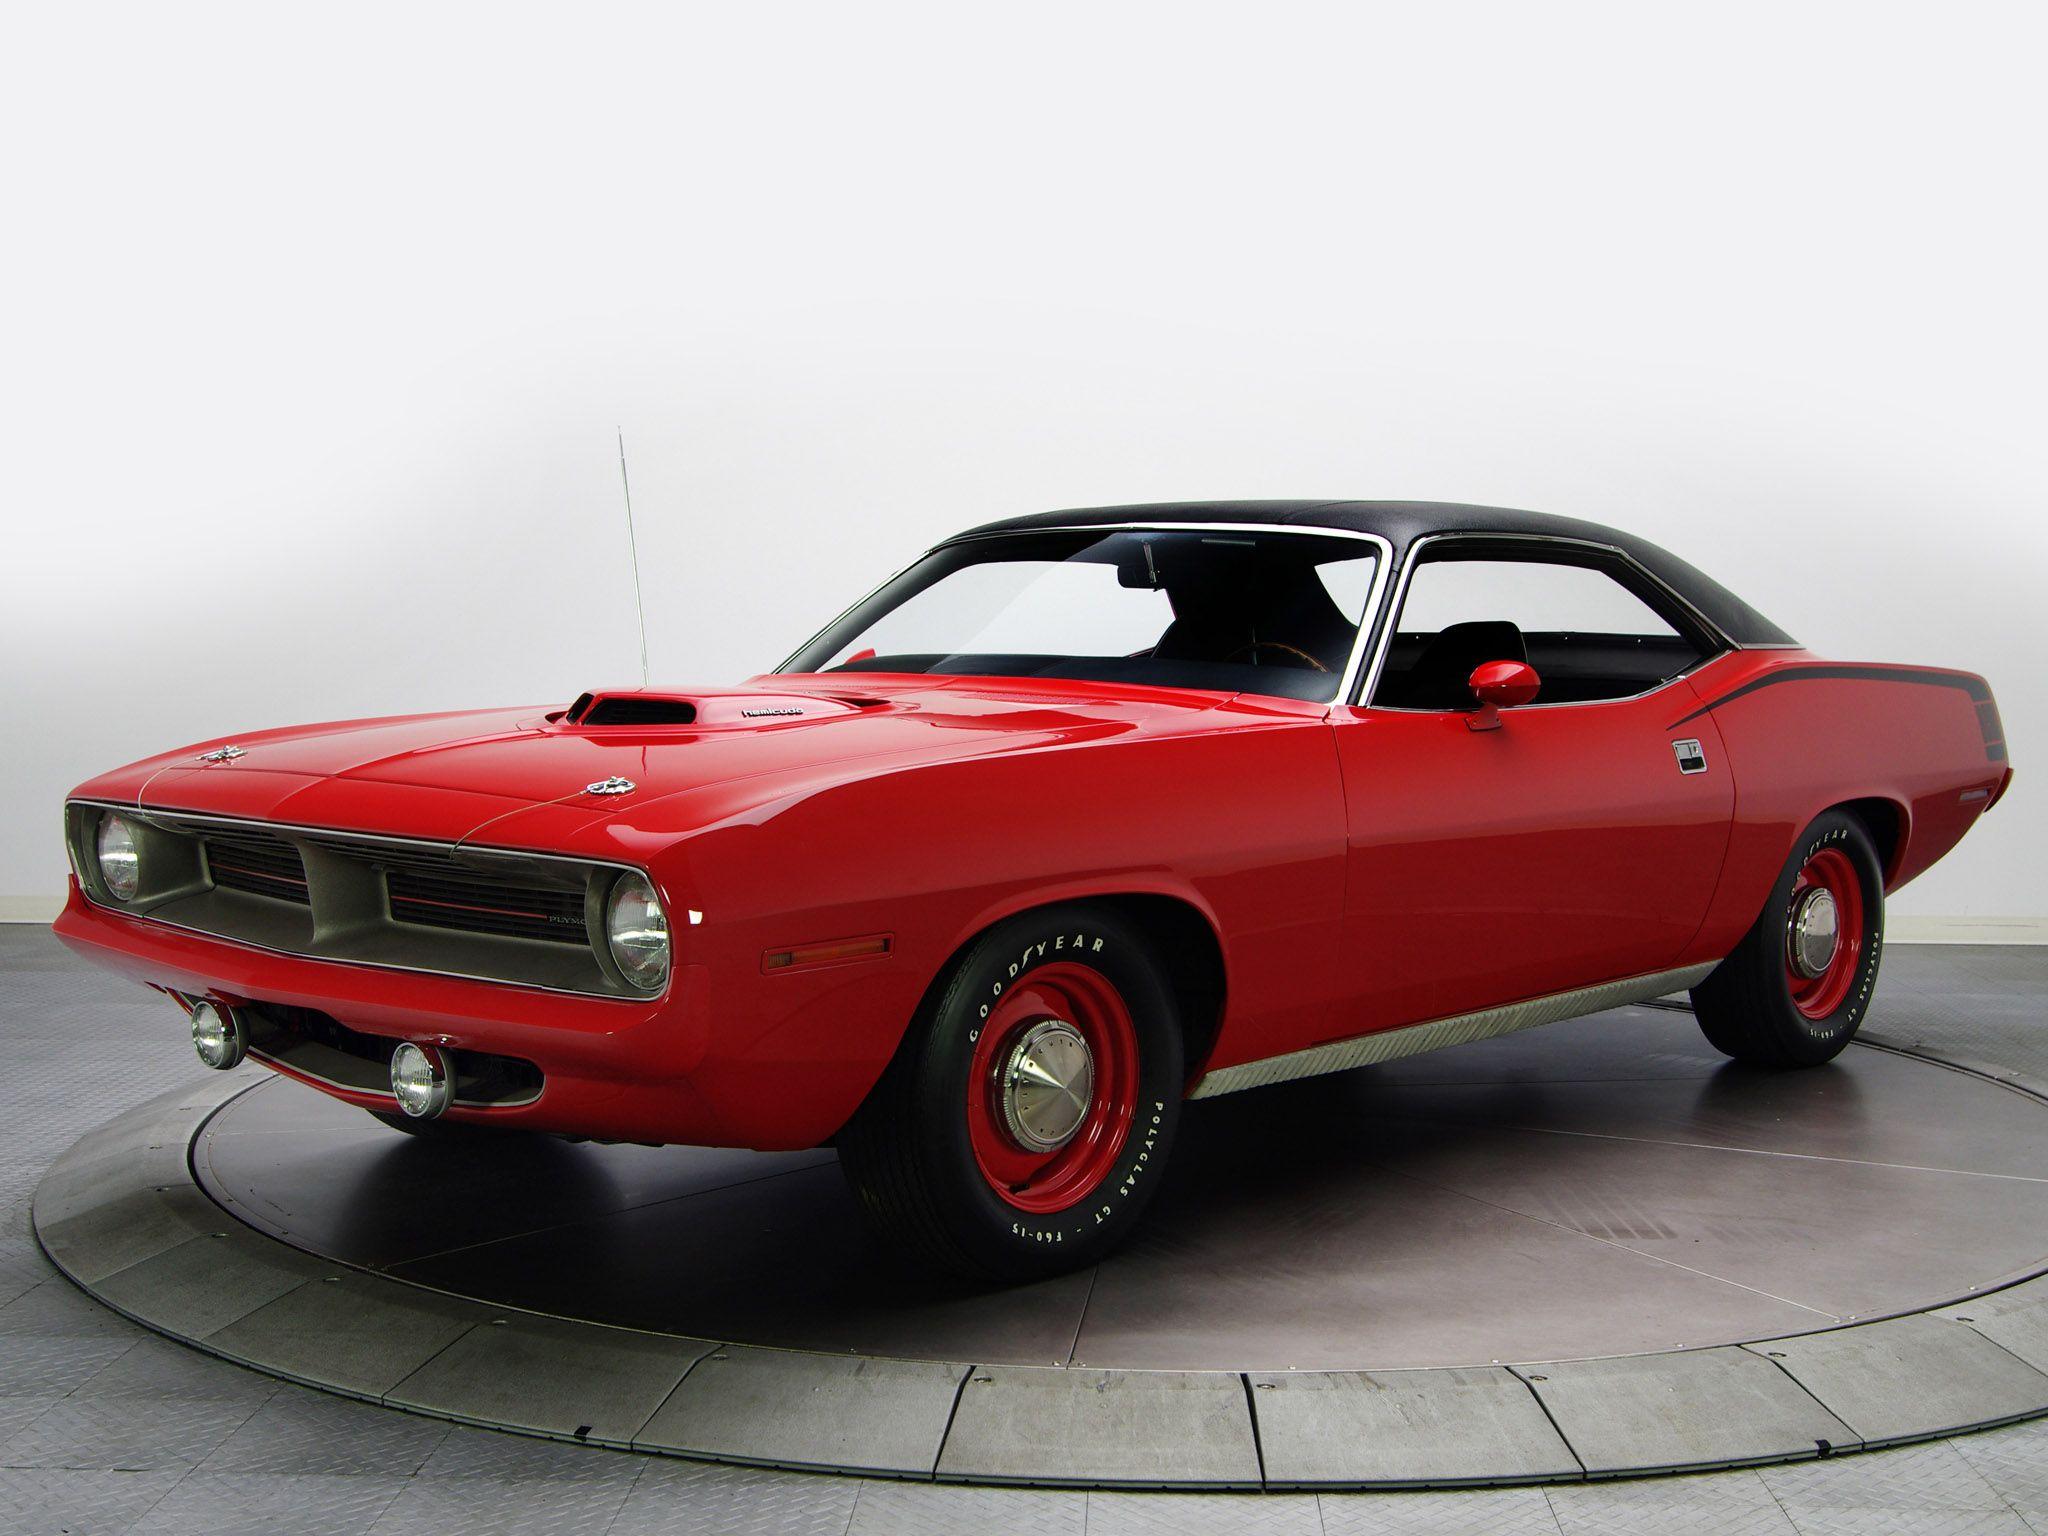 1970 Plymouth Hemi Cuda | Blog - MCG Social™ | MyClassicGarage ...